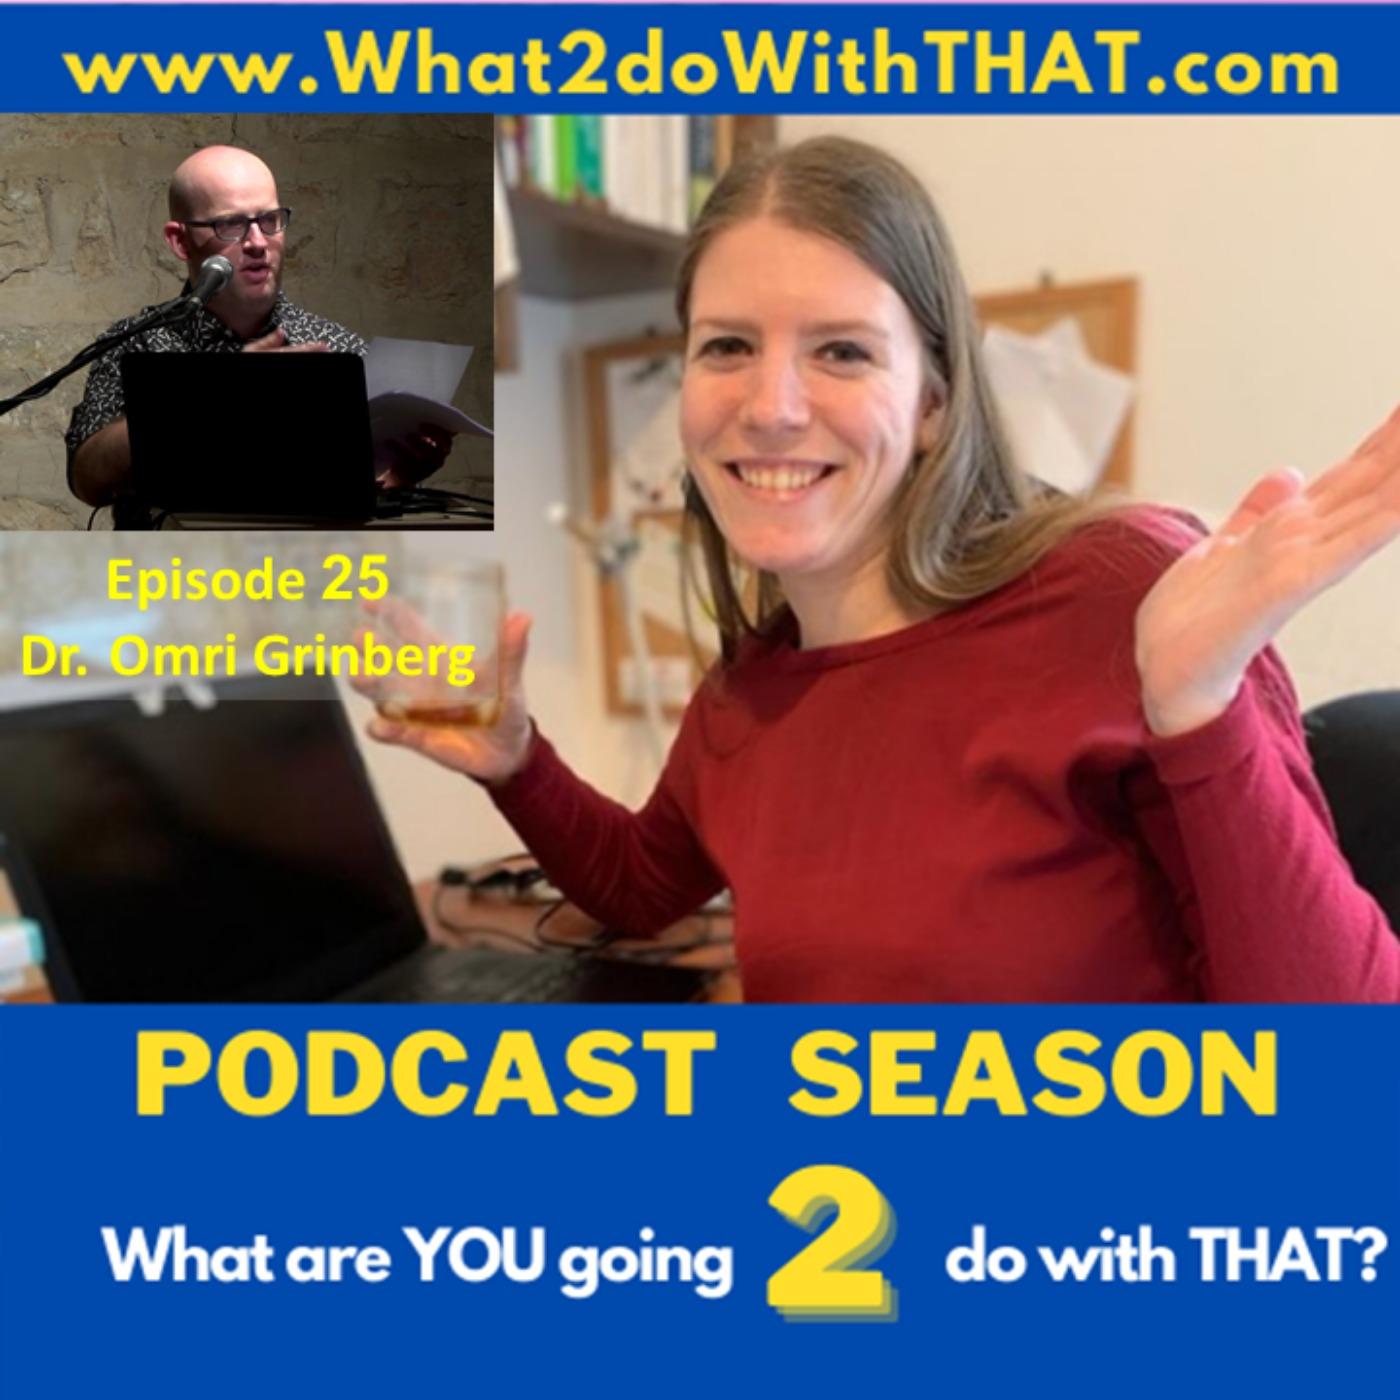 Episode 25 - Omri Grinberg